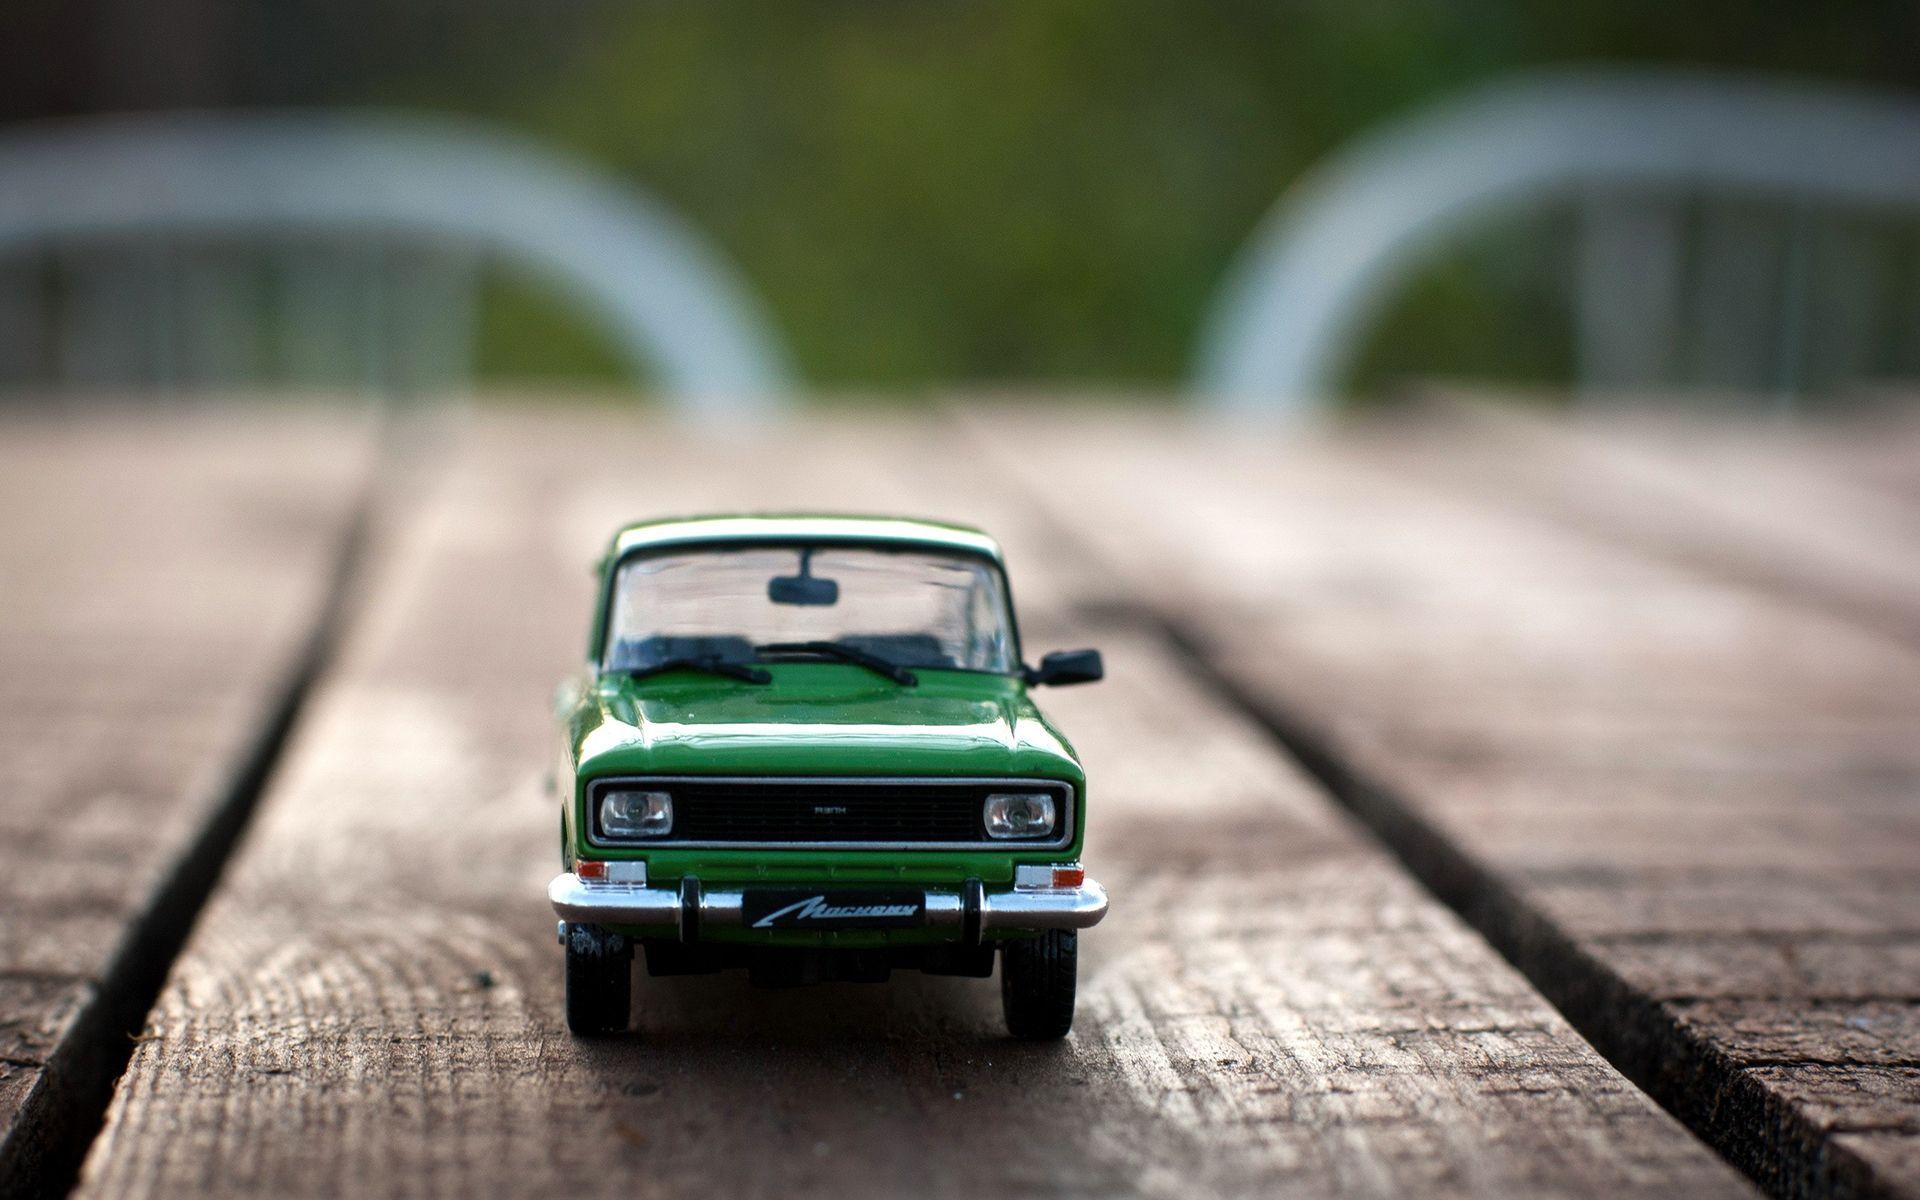 Classic Toy Car Disney Cars Wallpaper Car Hd Car